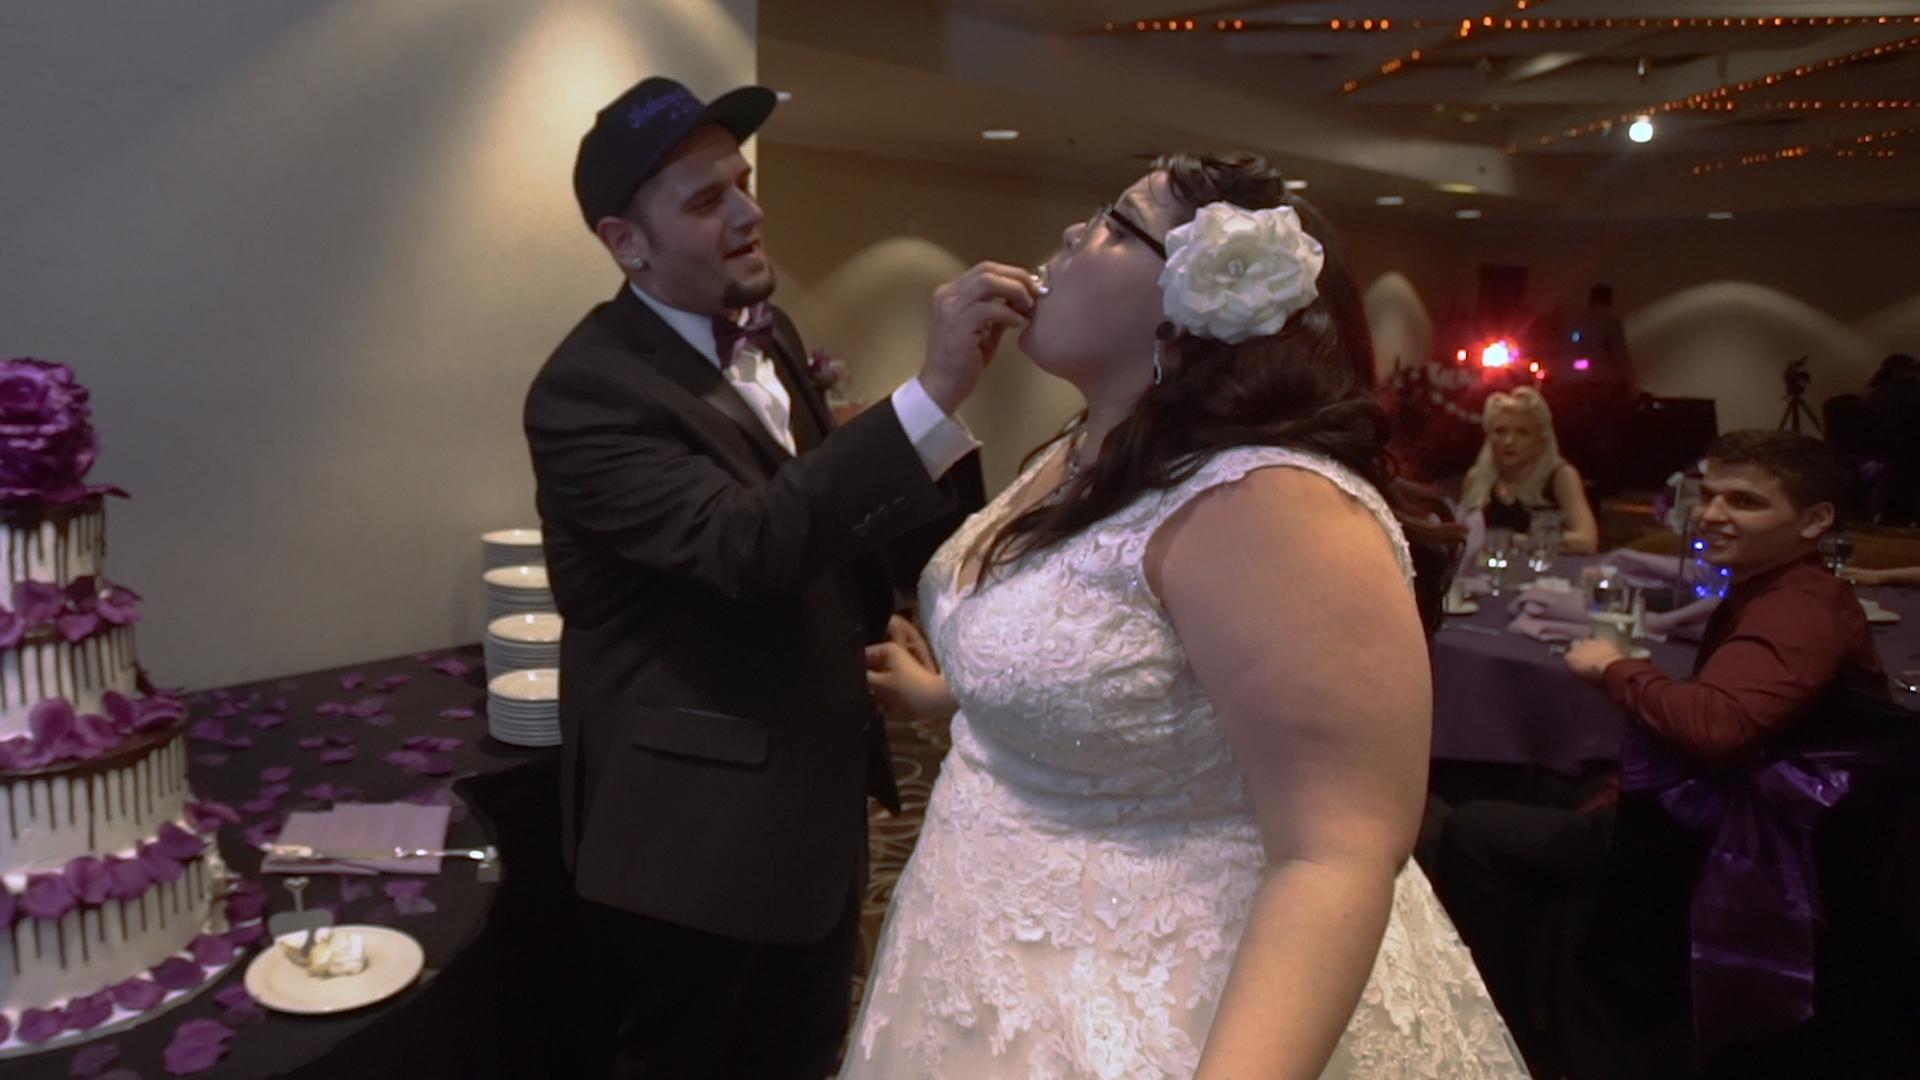 Dariana Anthony Wedding 2018 RECEPTION.01_32_02_06.Still054.jpg